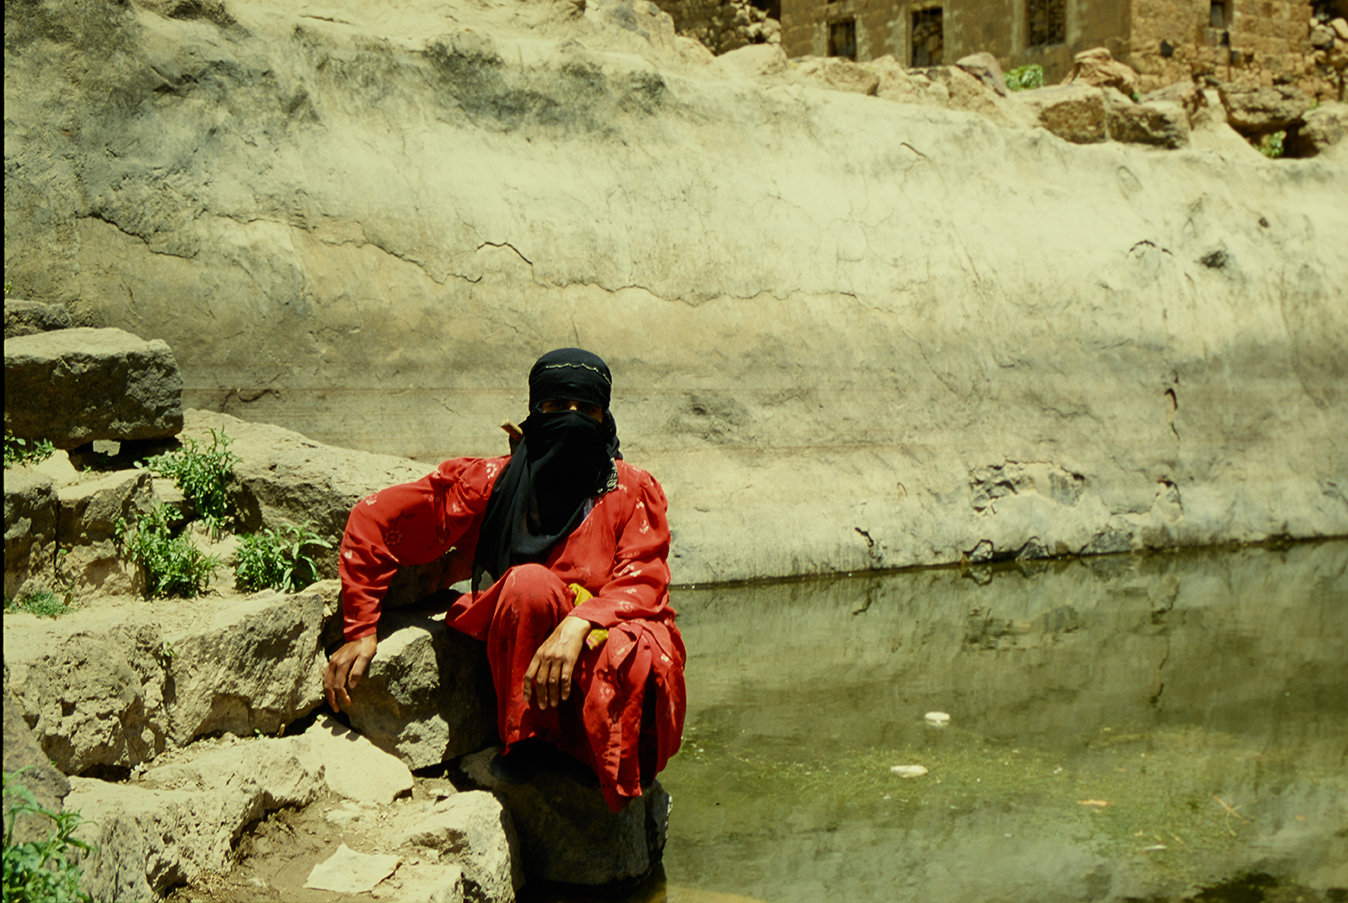 Farian Sabahi,  Yemen , 2001 (stampa 2019), pellicola 100-36 Sensia Fujichrome - stampa fine art ai pigmenti su carta cotone Hahnemühle Photo Rag 308, 30 x 45 cm, courtesy:Farian Sabahi